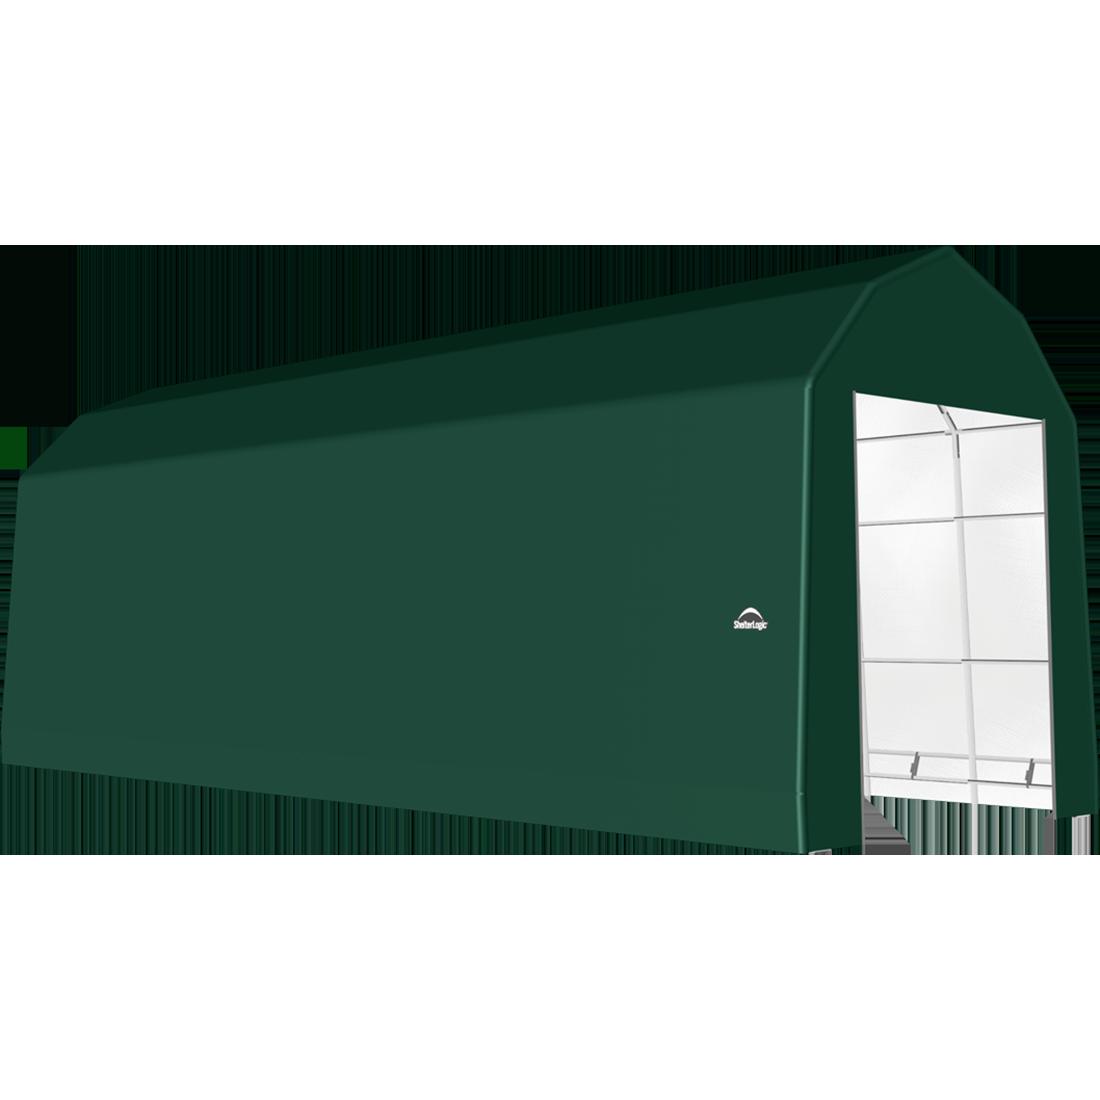 SP Barn 15X44X17 Green 14 oz PE Shelter